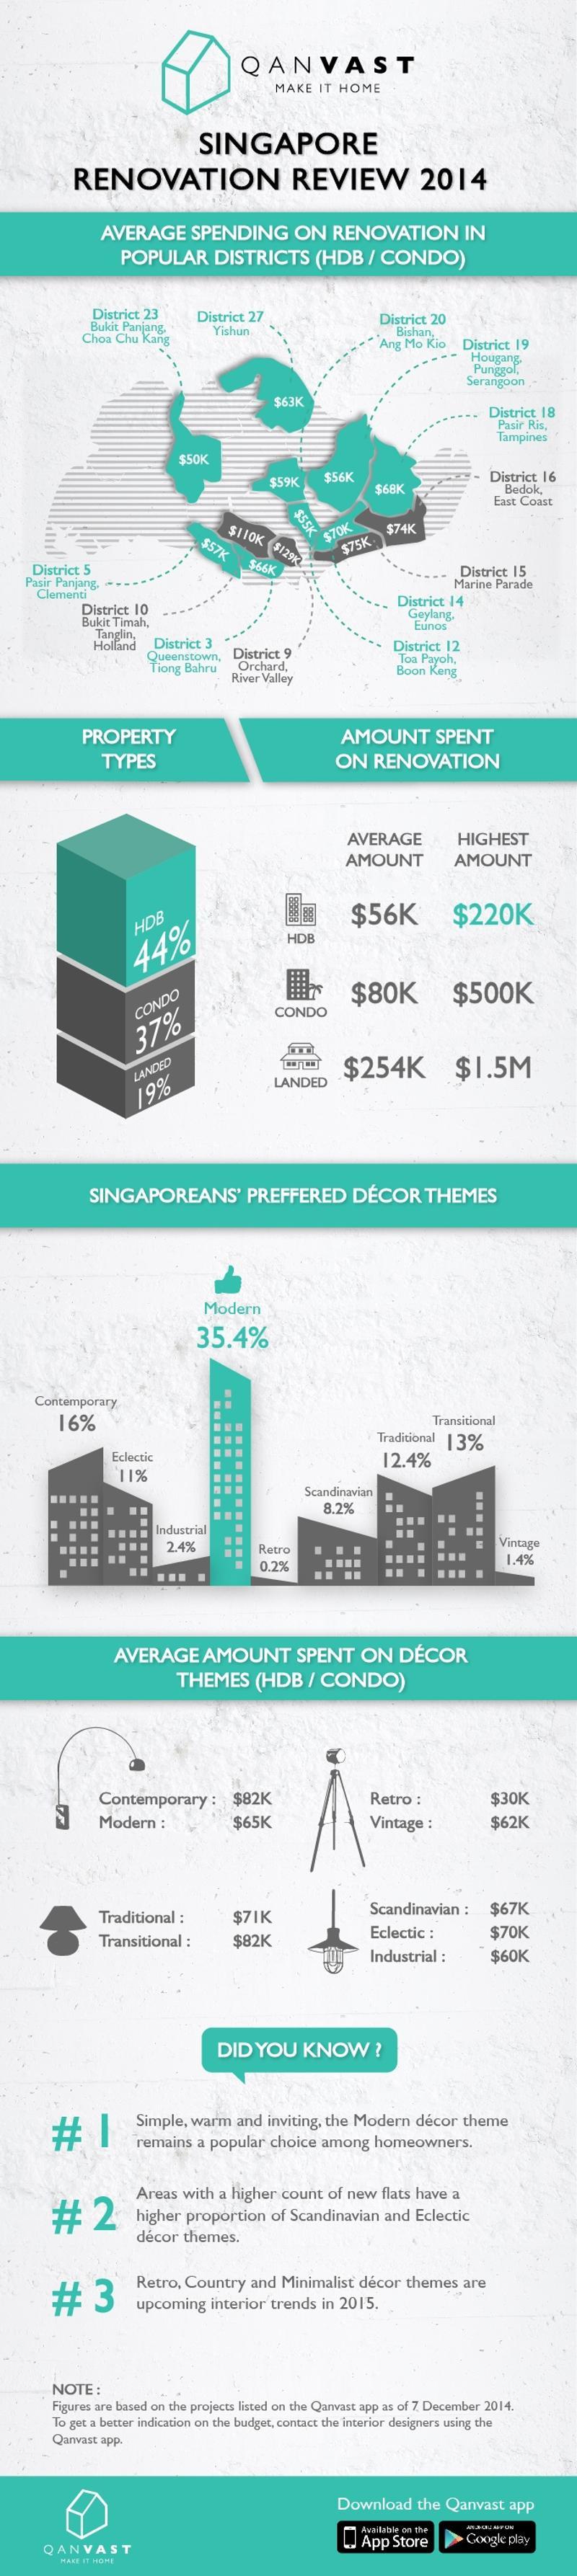 Qanvast--Singapore-Renovation-Review-2014